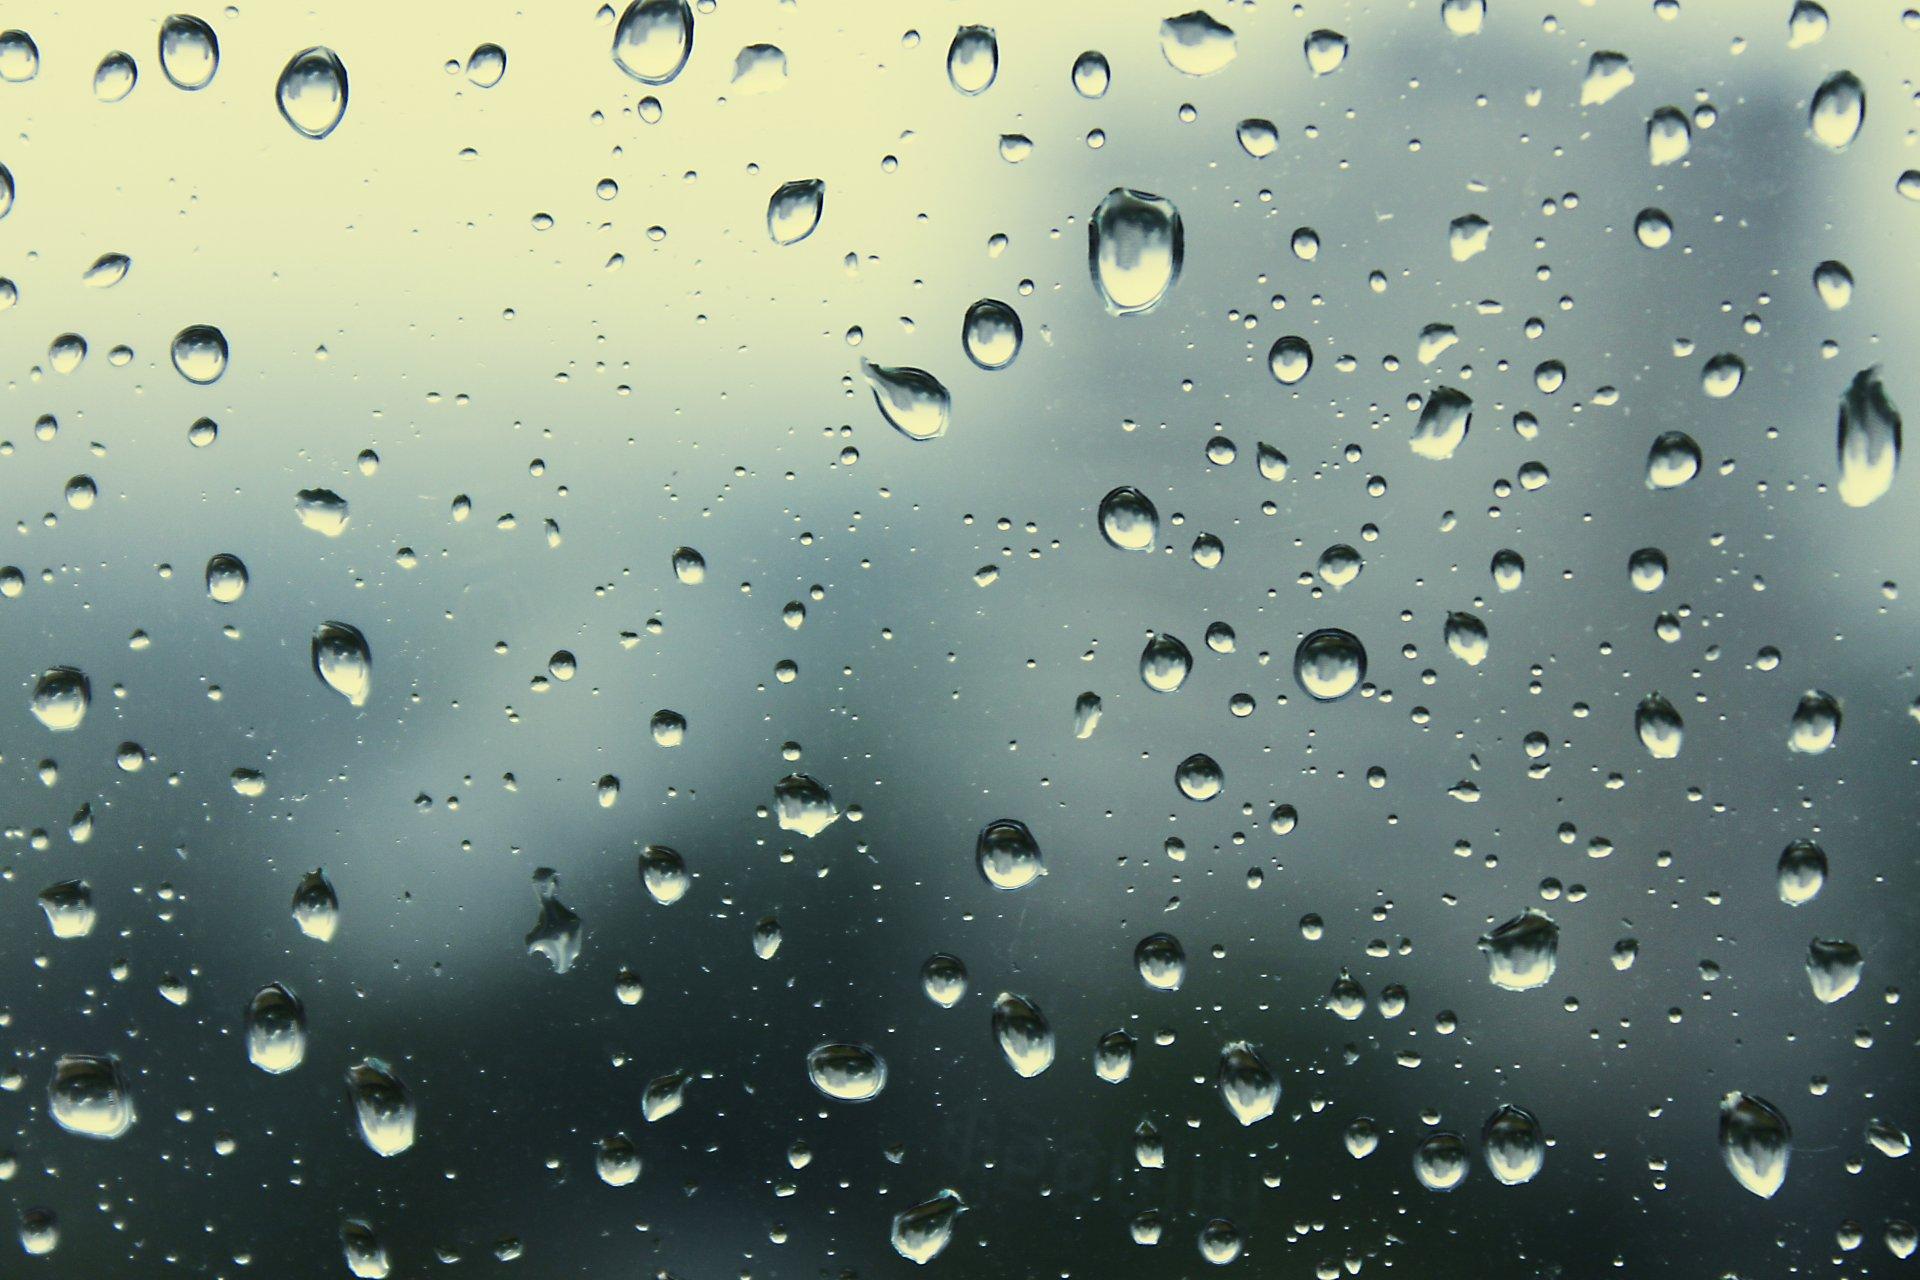 обои дождя на телефон сравнения время японии